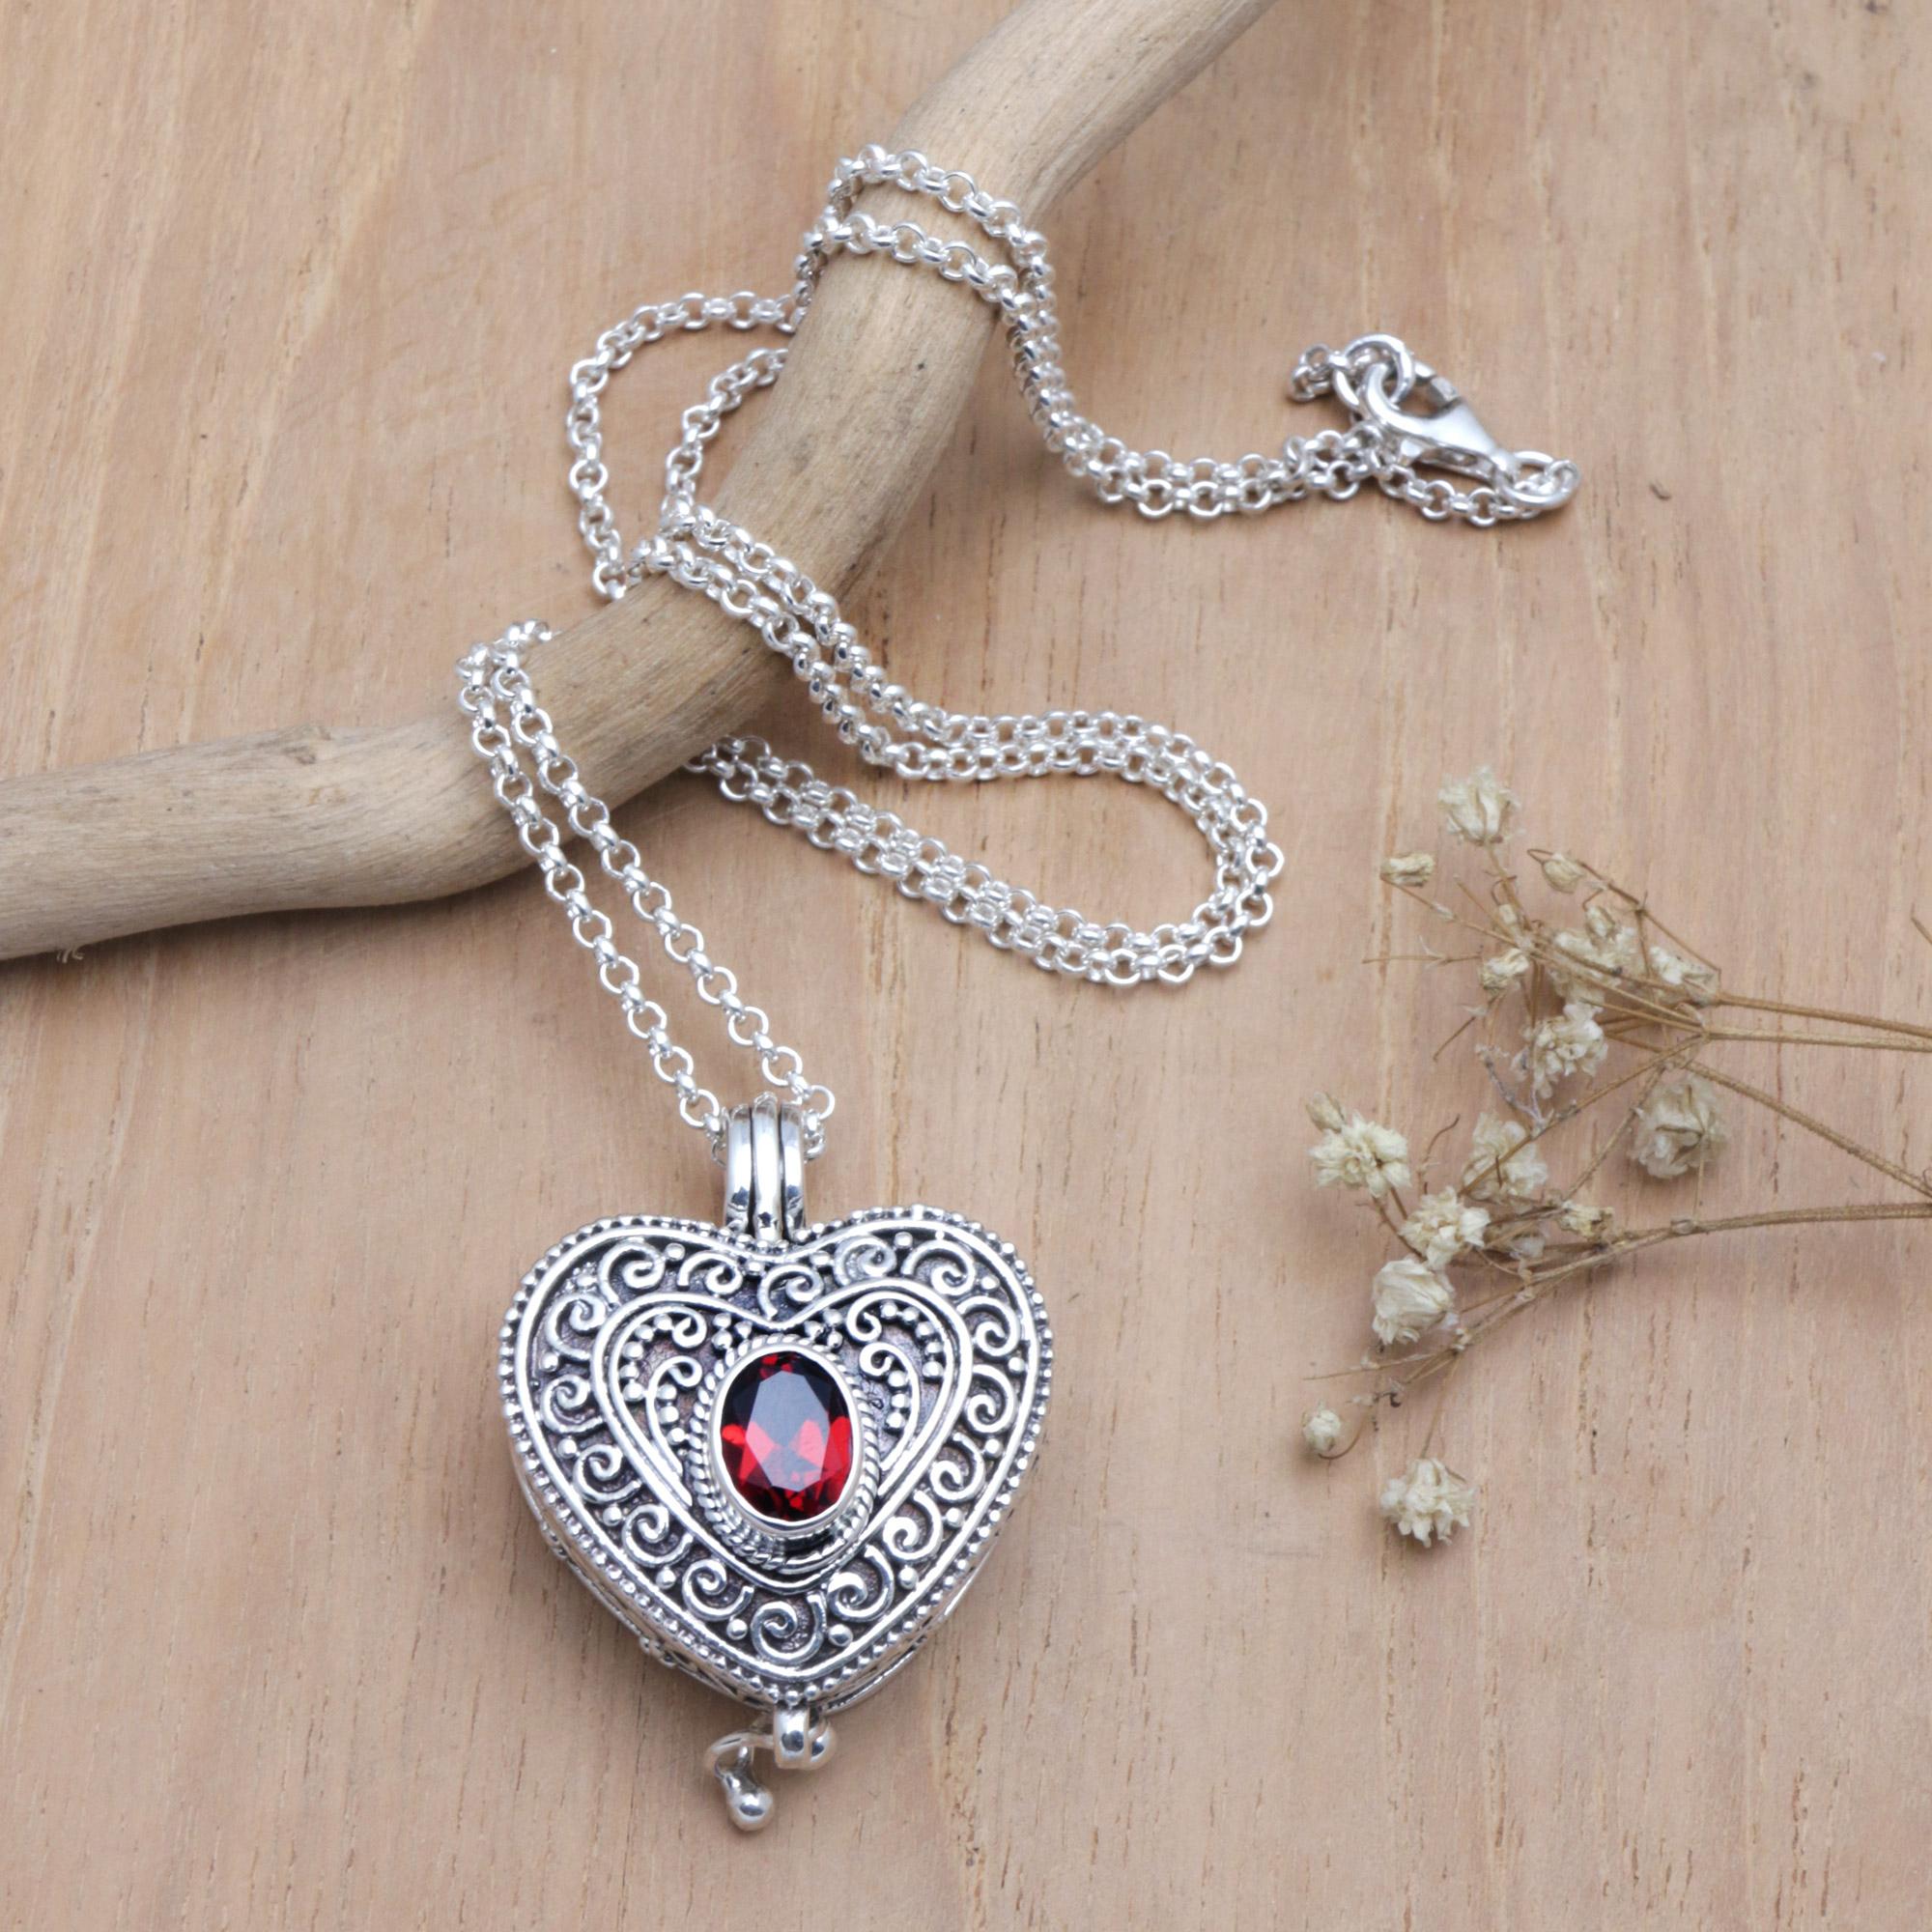 b0b703b47b2b7a Garnet and Sterling Silver Heart Shaped Locket Necklace,